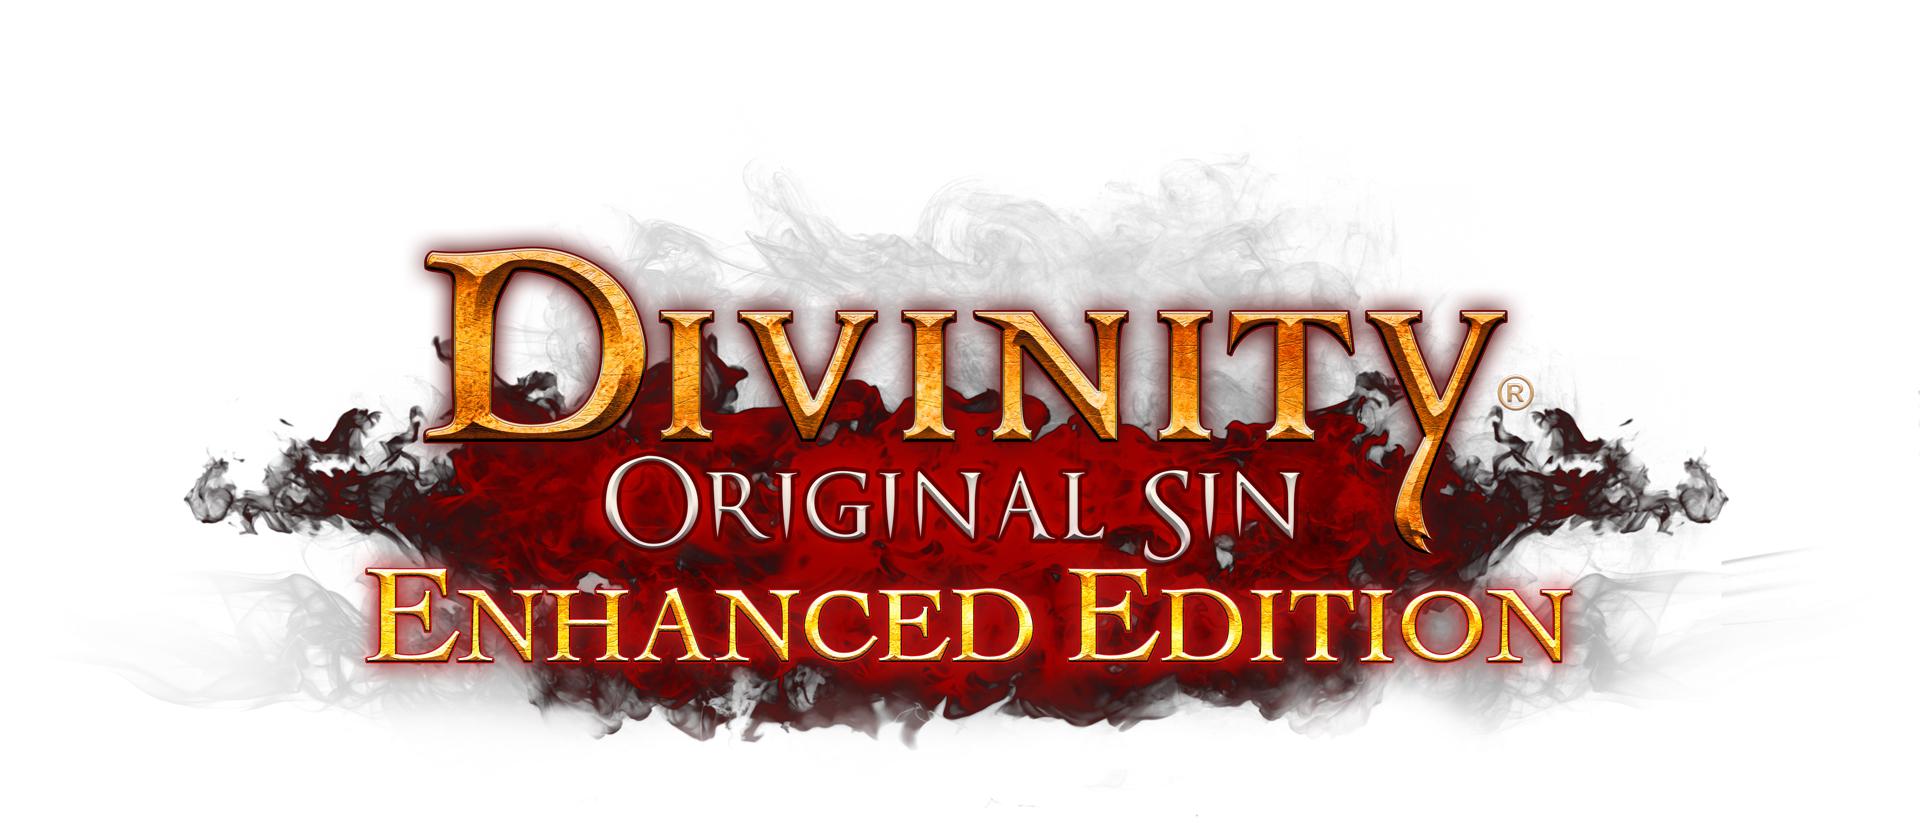 Divinity: Original Sin Enhanced Edition - Logo